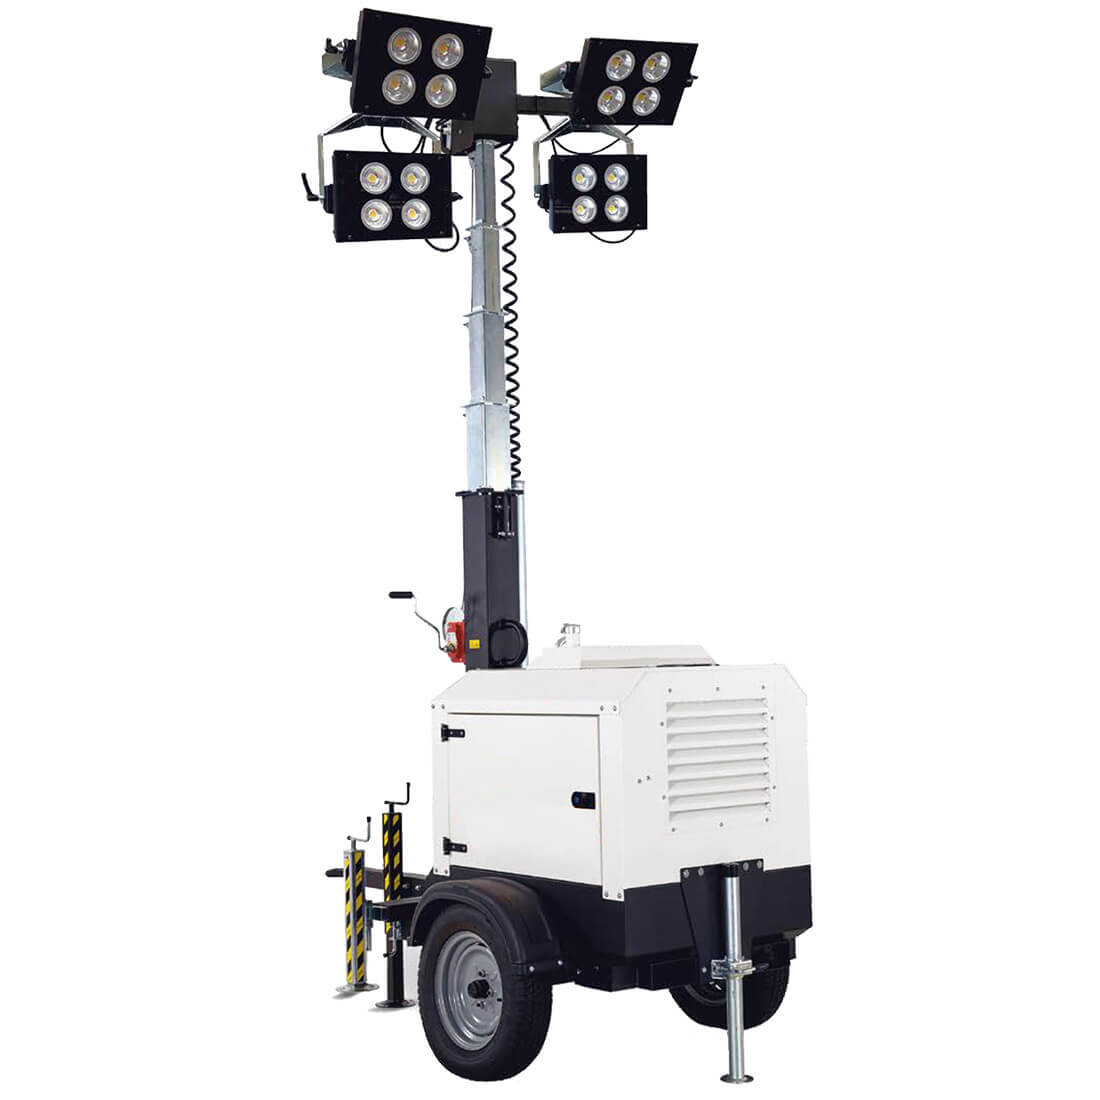 Alquiler de torre de iluminaci n 4 focos led con remolque for Focos iluminacion exterior